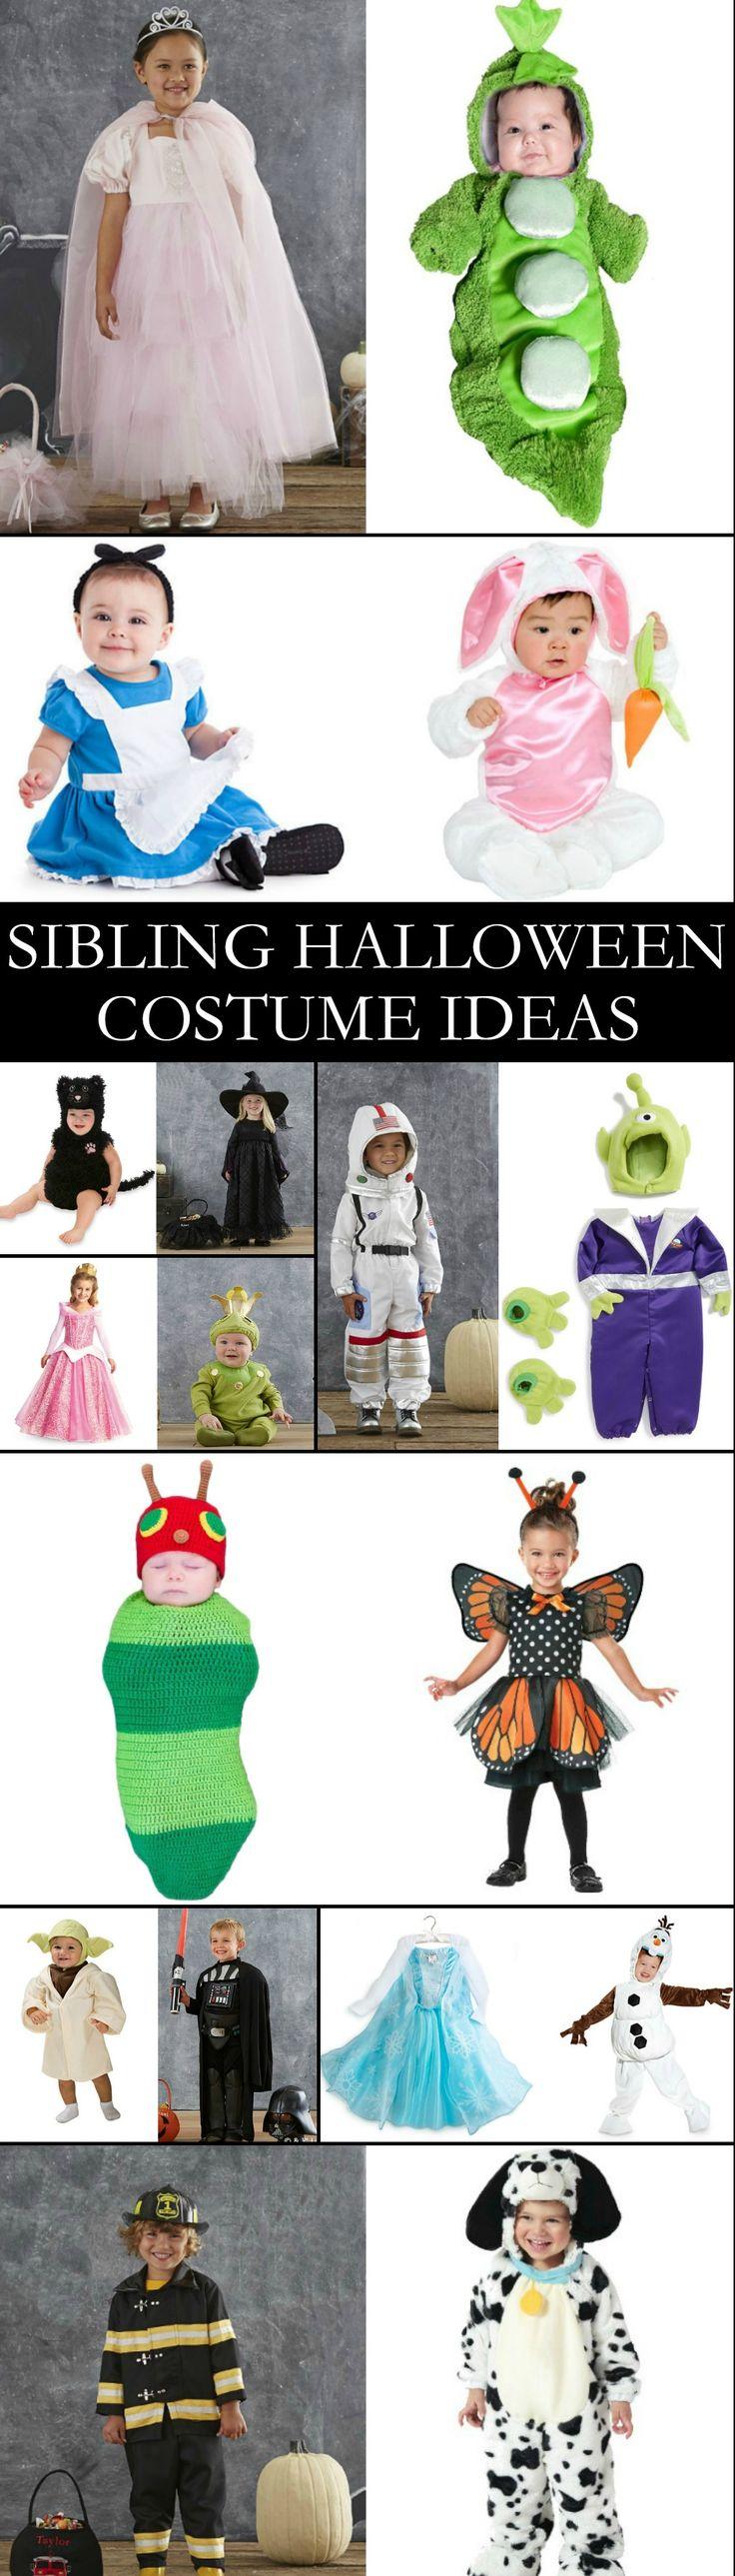 Sibling Halloween Costume Ideas